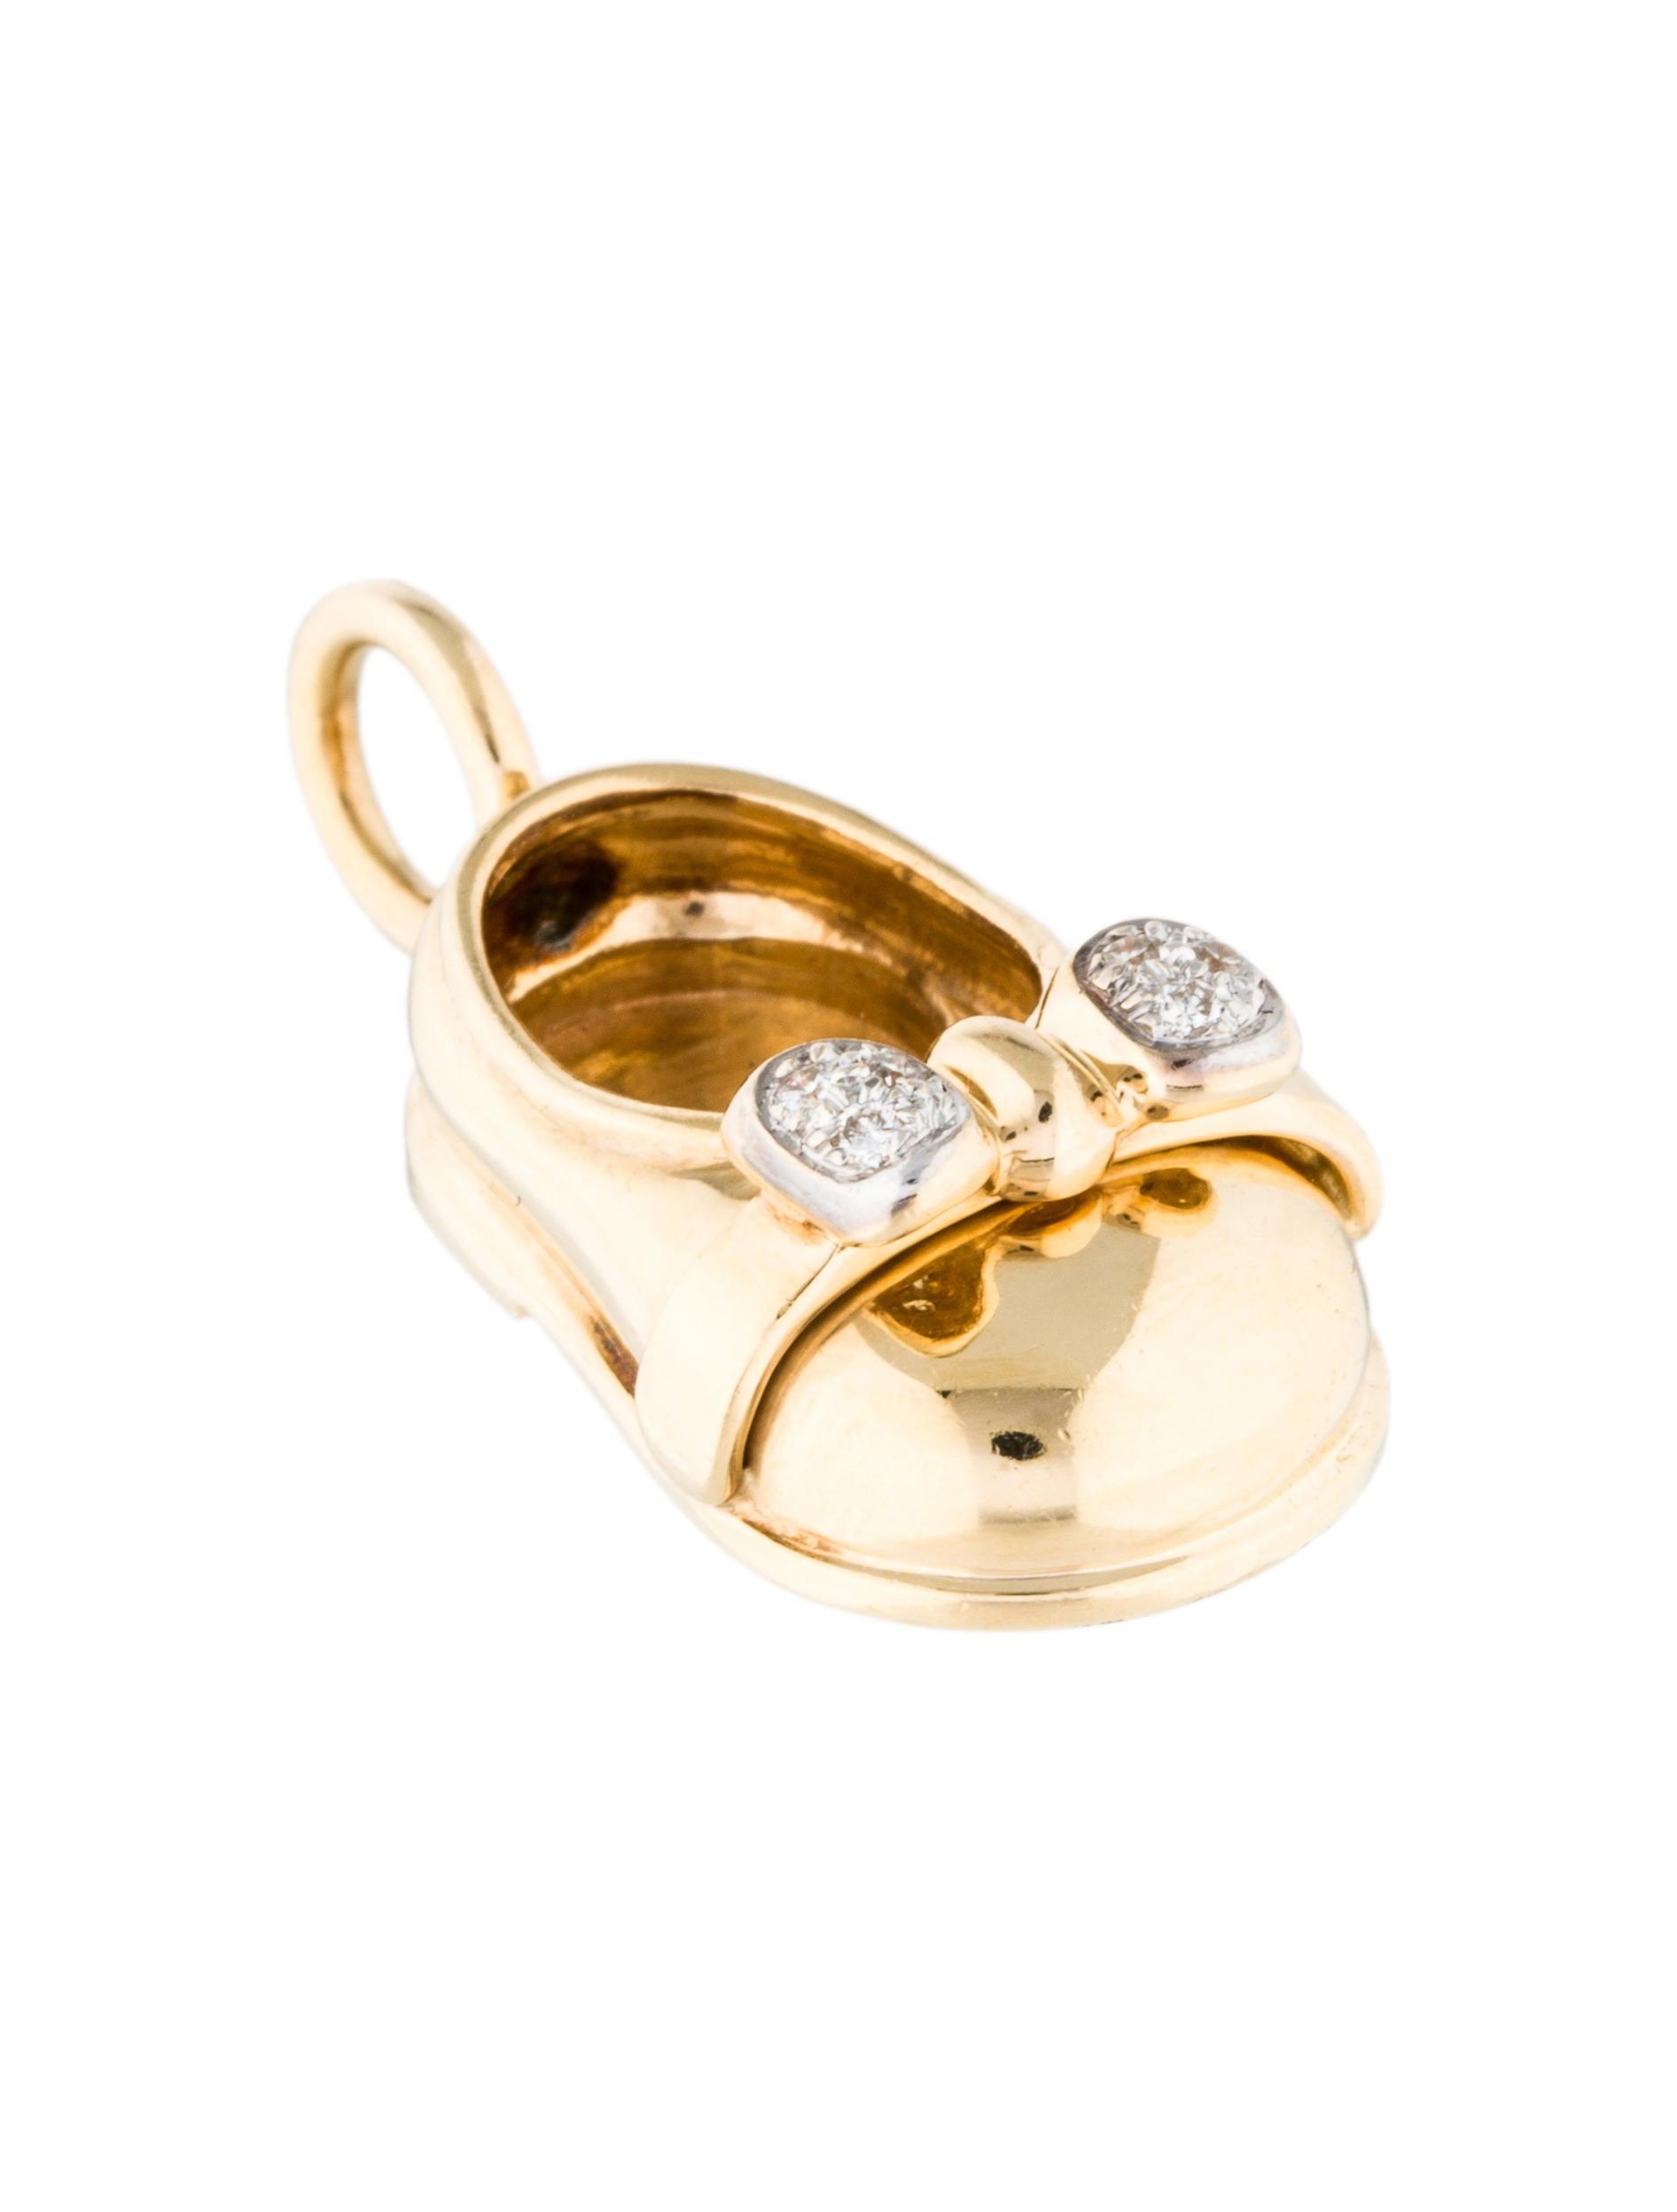 14k Diamond Baby Shoe Pendant  Necklaces  Penda22193. Chasing Fin Bracelet. Wide Band Diamond Rings. Marcasite Jewelry. Cross Bracelet. Silver Jewellery. 14k Necklace. Cylinder Pendant. Eta Watches